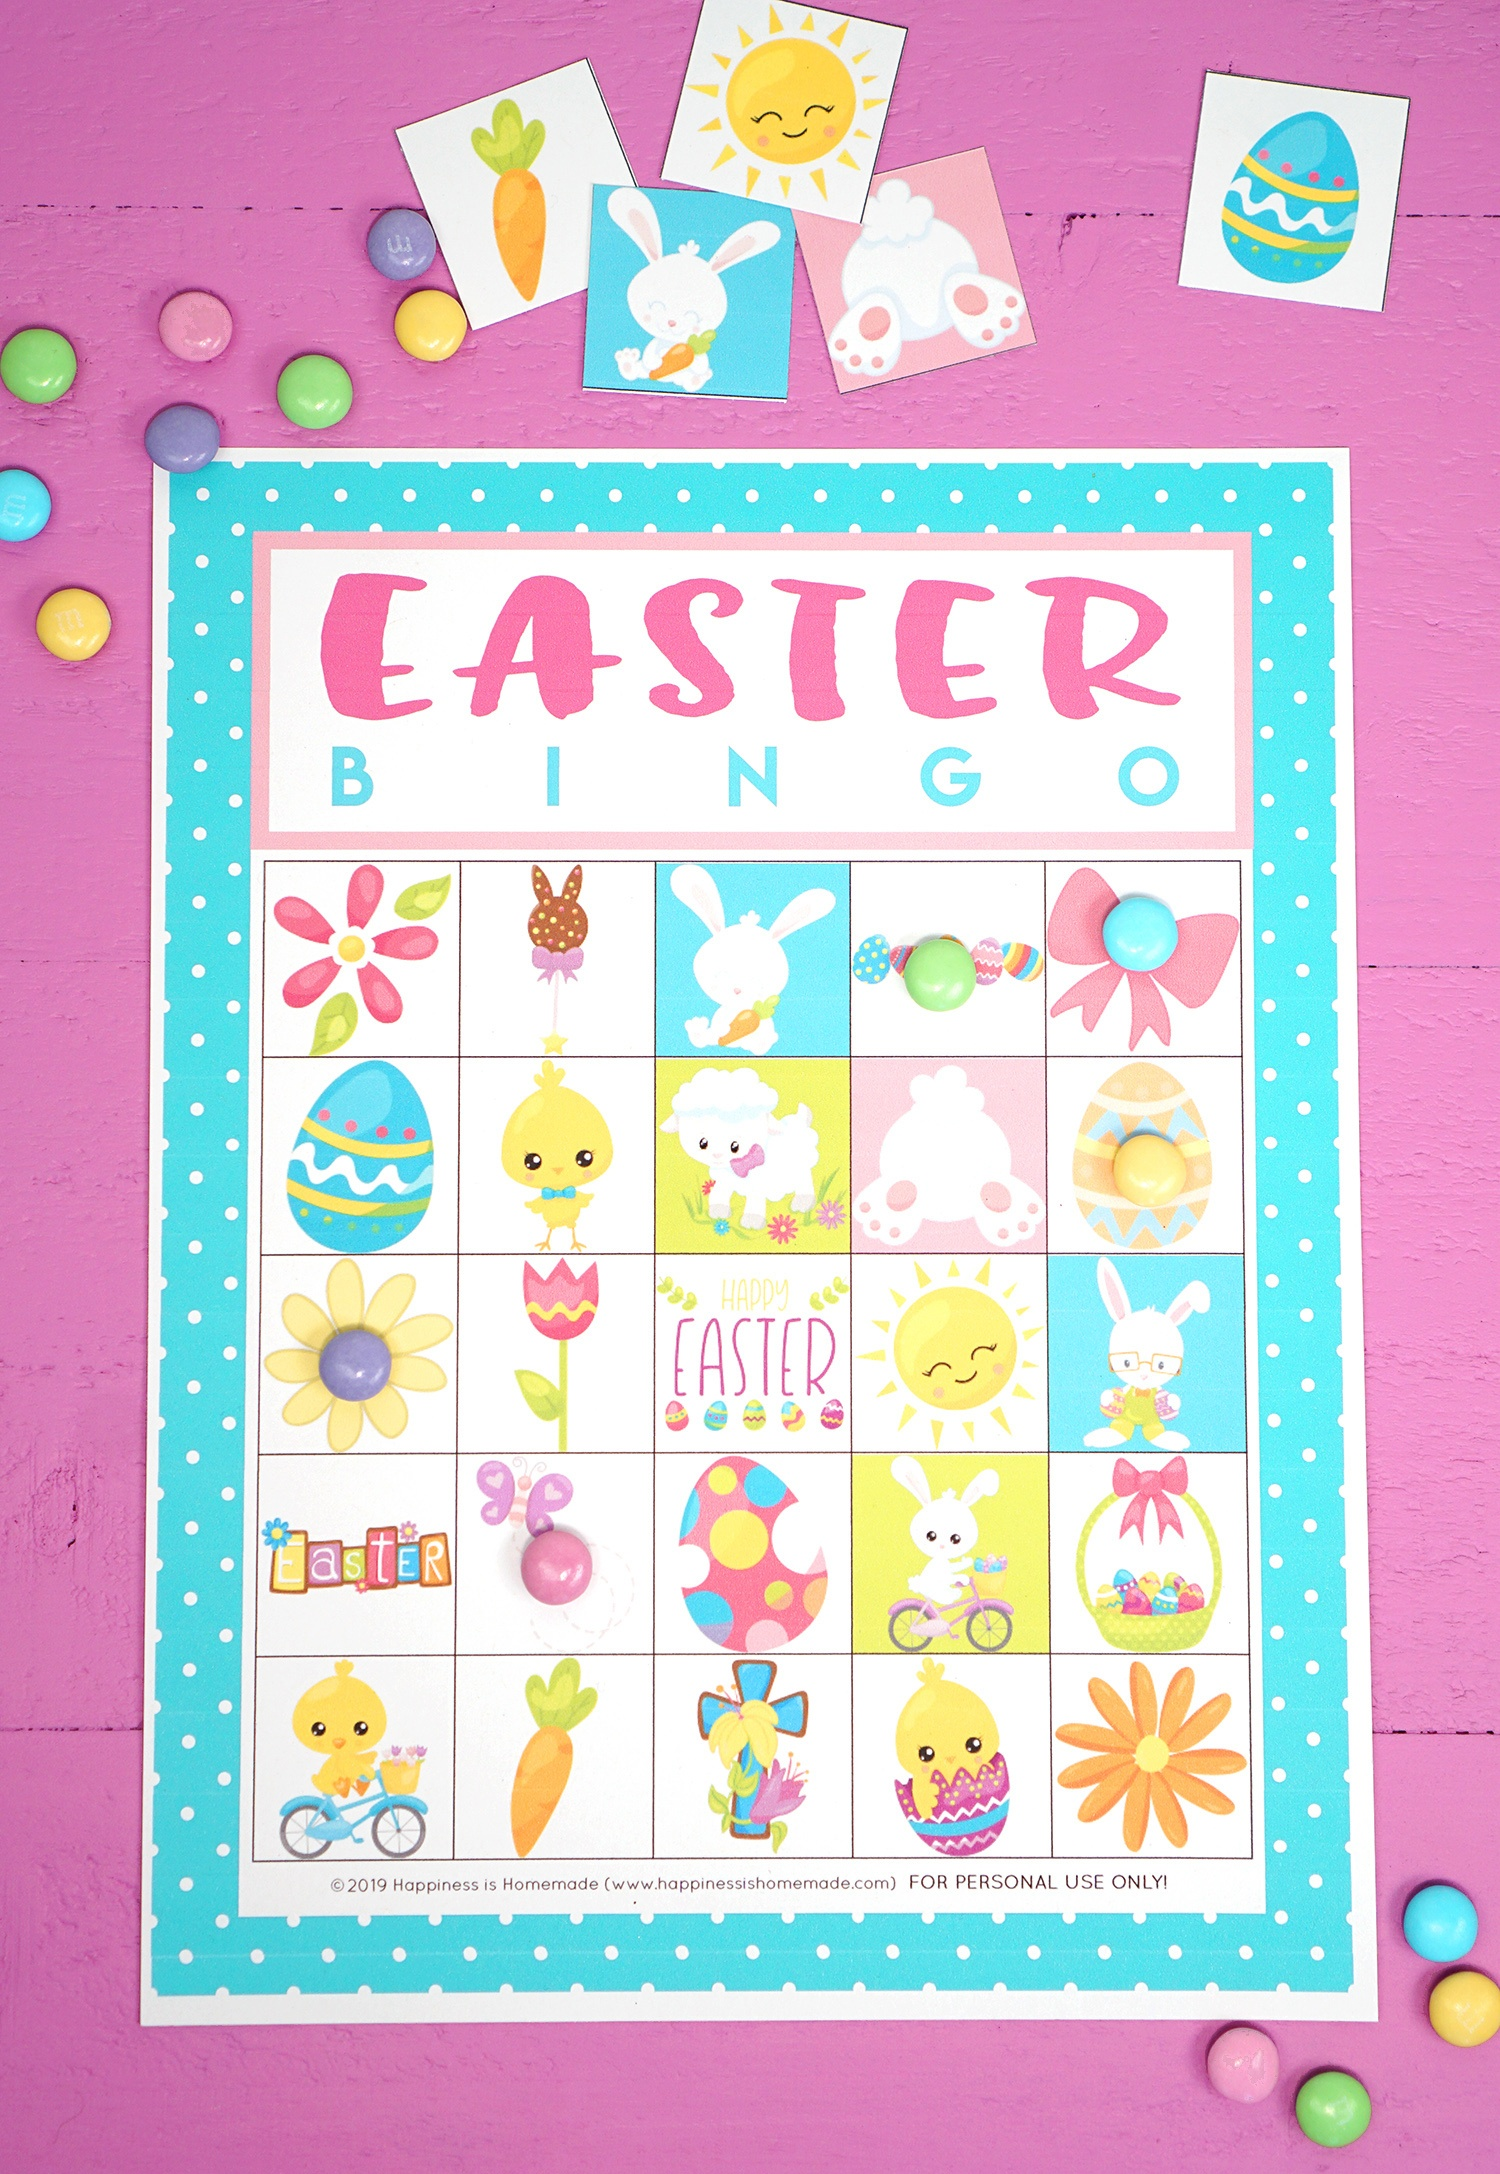 Free Printable Easter Bingo Game Cards - Happiness Is Homemade - Free Printable Easter Cards